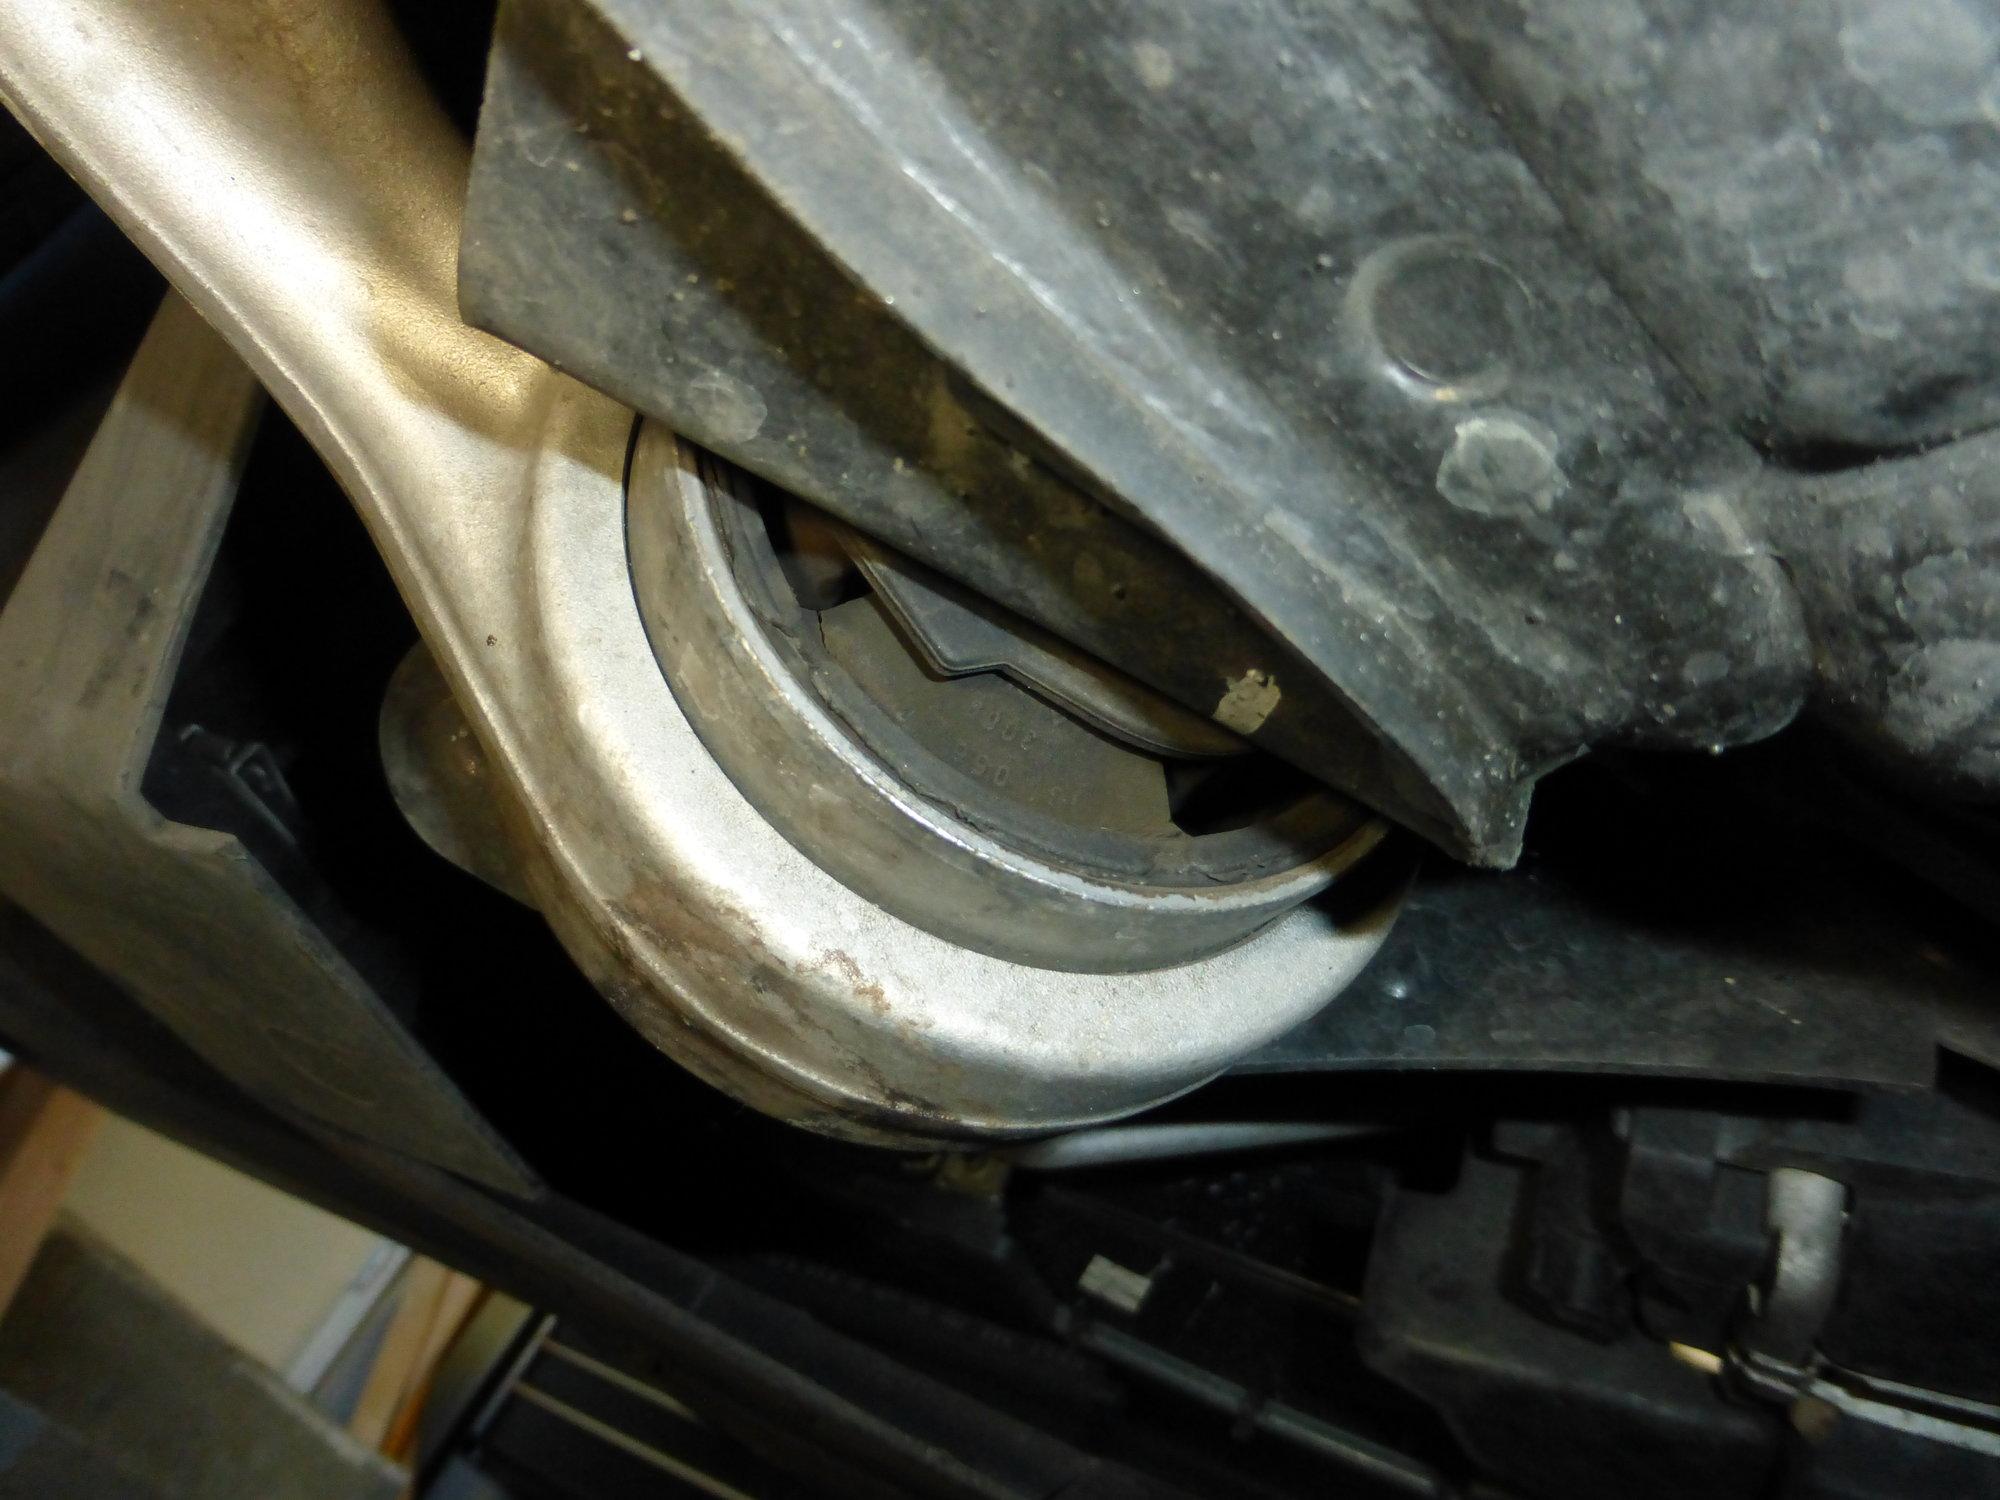 JAGUAR S-TYPE Rear Lower Control Arm Fluid Hydrabushes BUSHING Bushings SET 6